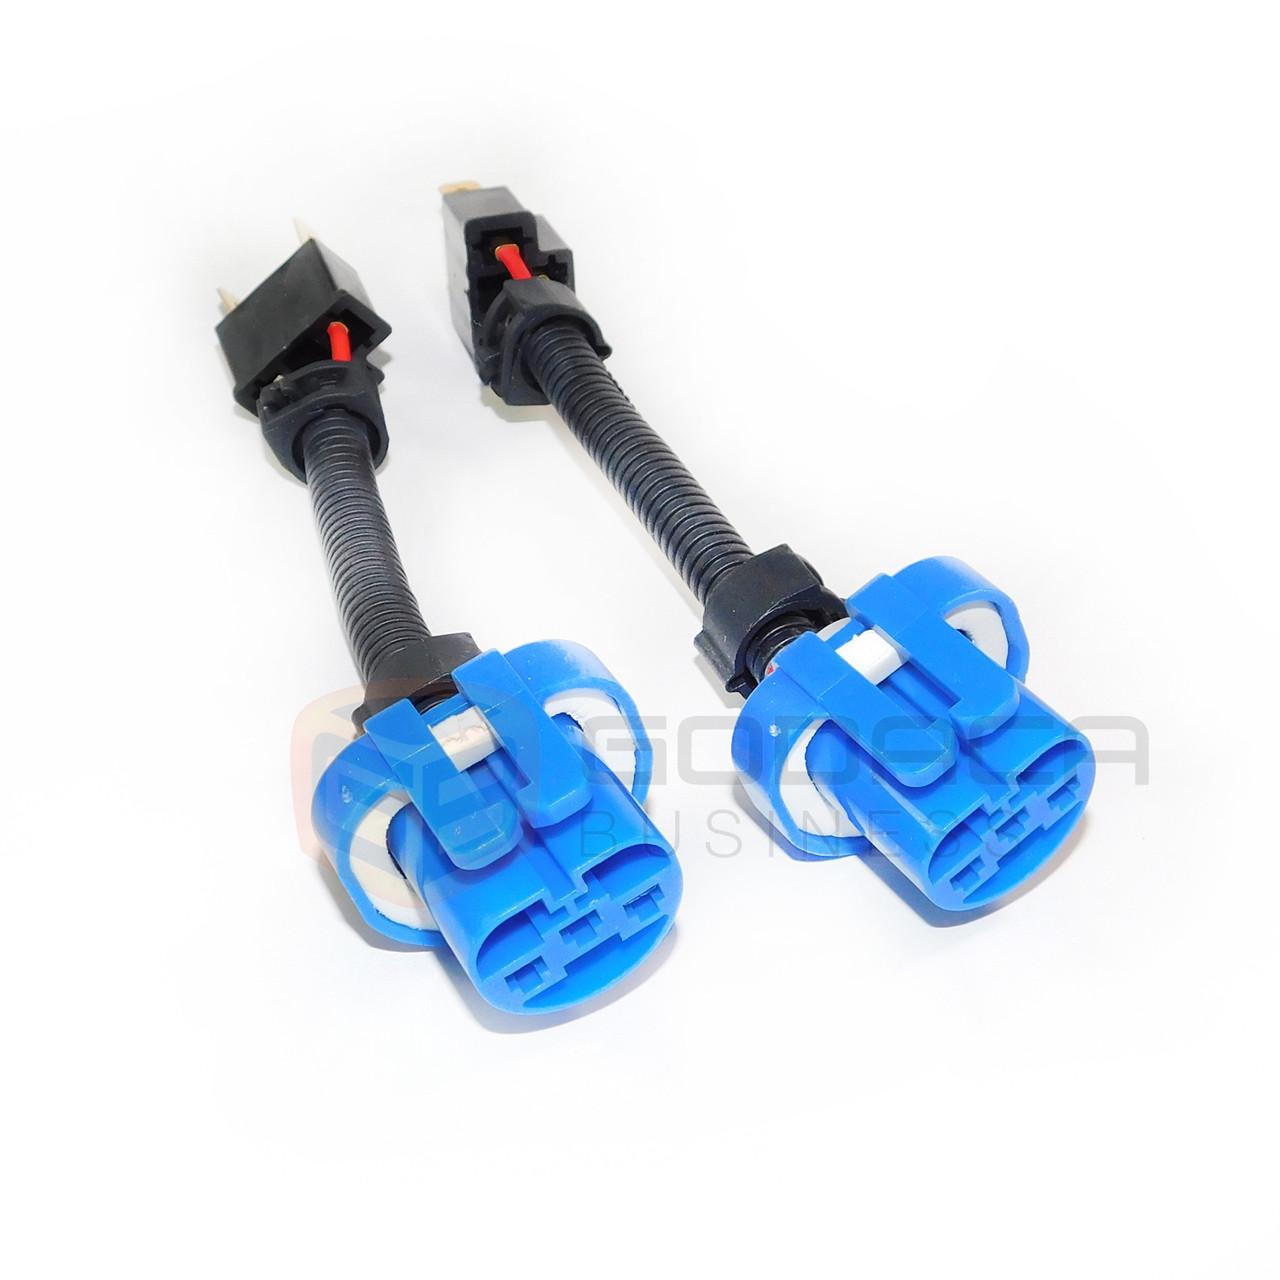 hight resolution of 2x h4 9003 to 9007 hb5 headlight wiring conversion adapter plug play godaca llc